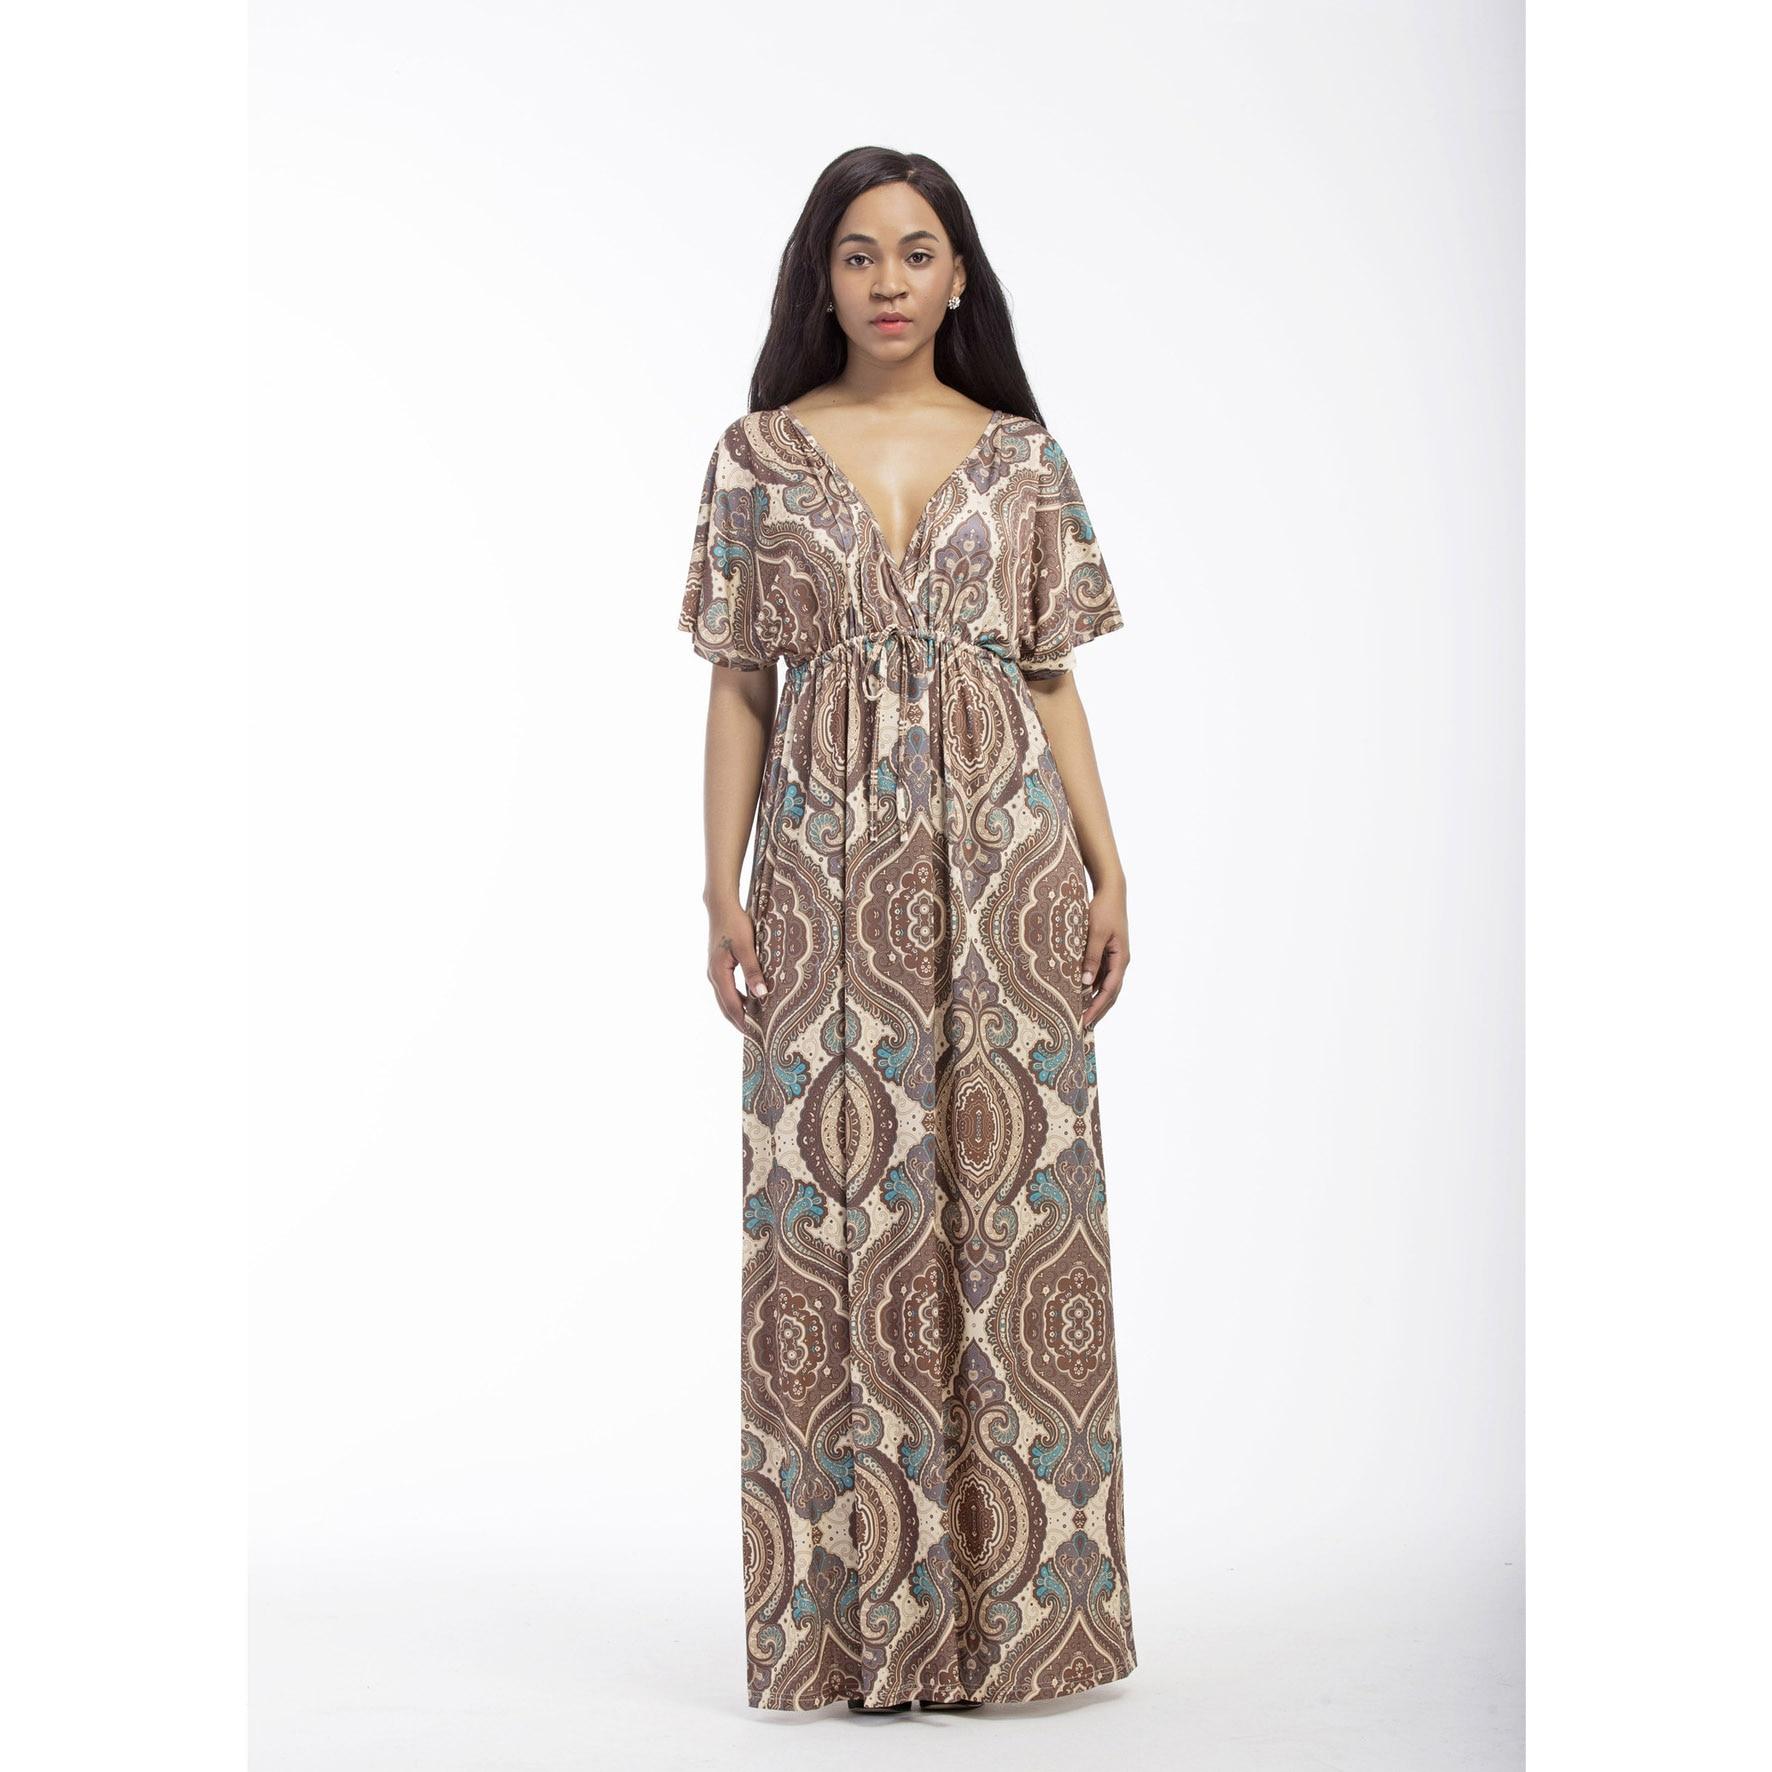 2018 Plus Size Elegant Fashion Women's Deep V Printing Short Sleeve Loose Dress 4 Color